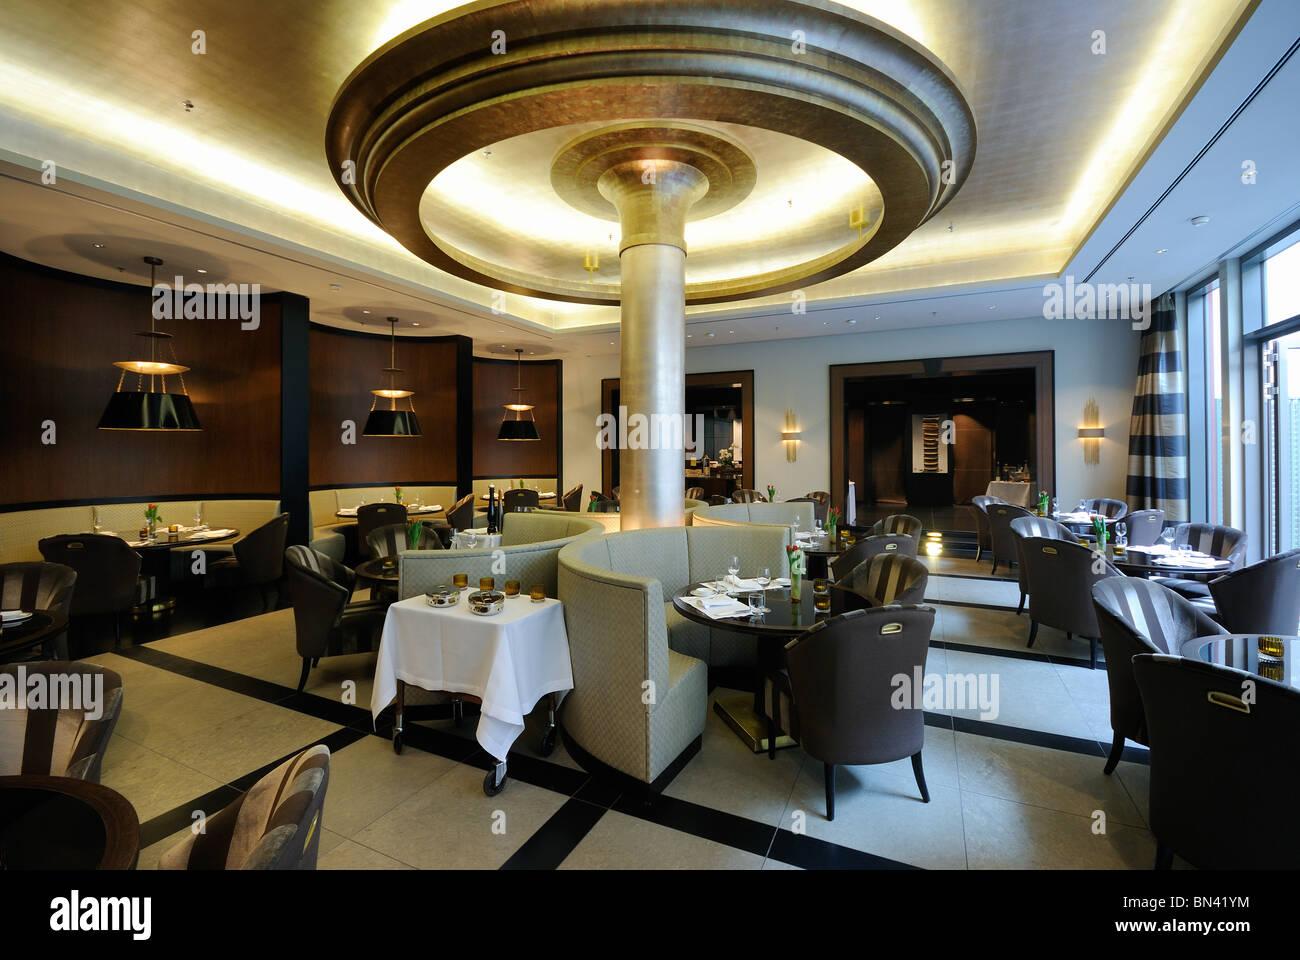 Paroli Restaurant Hotel De Rome Luxury Hotel Historic Five Star